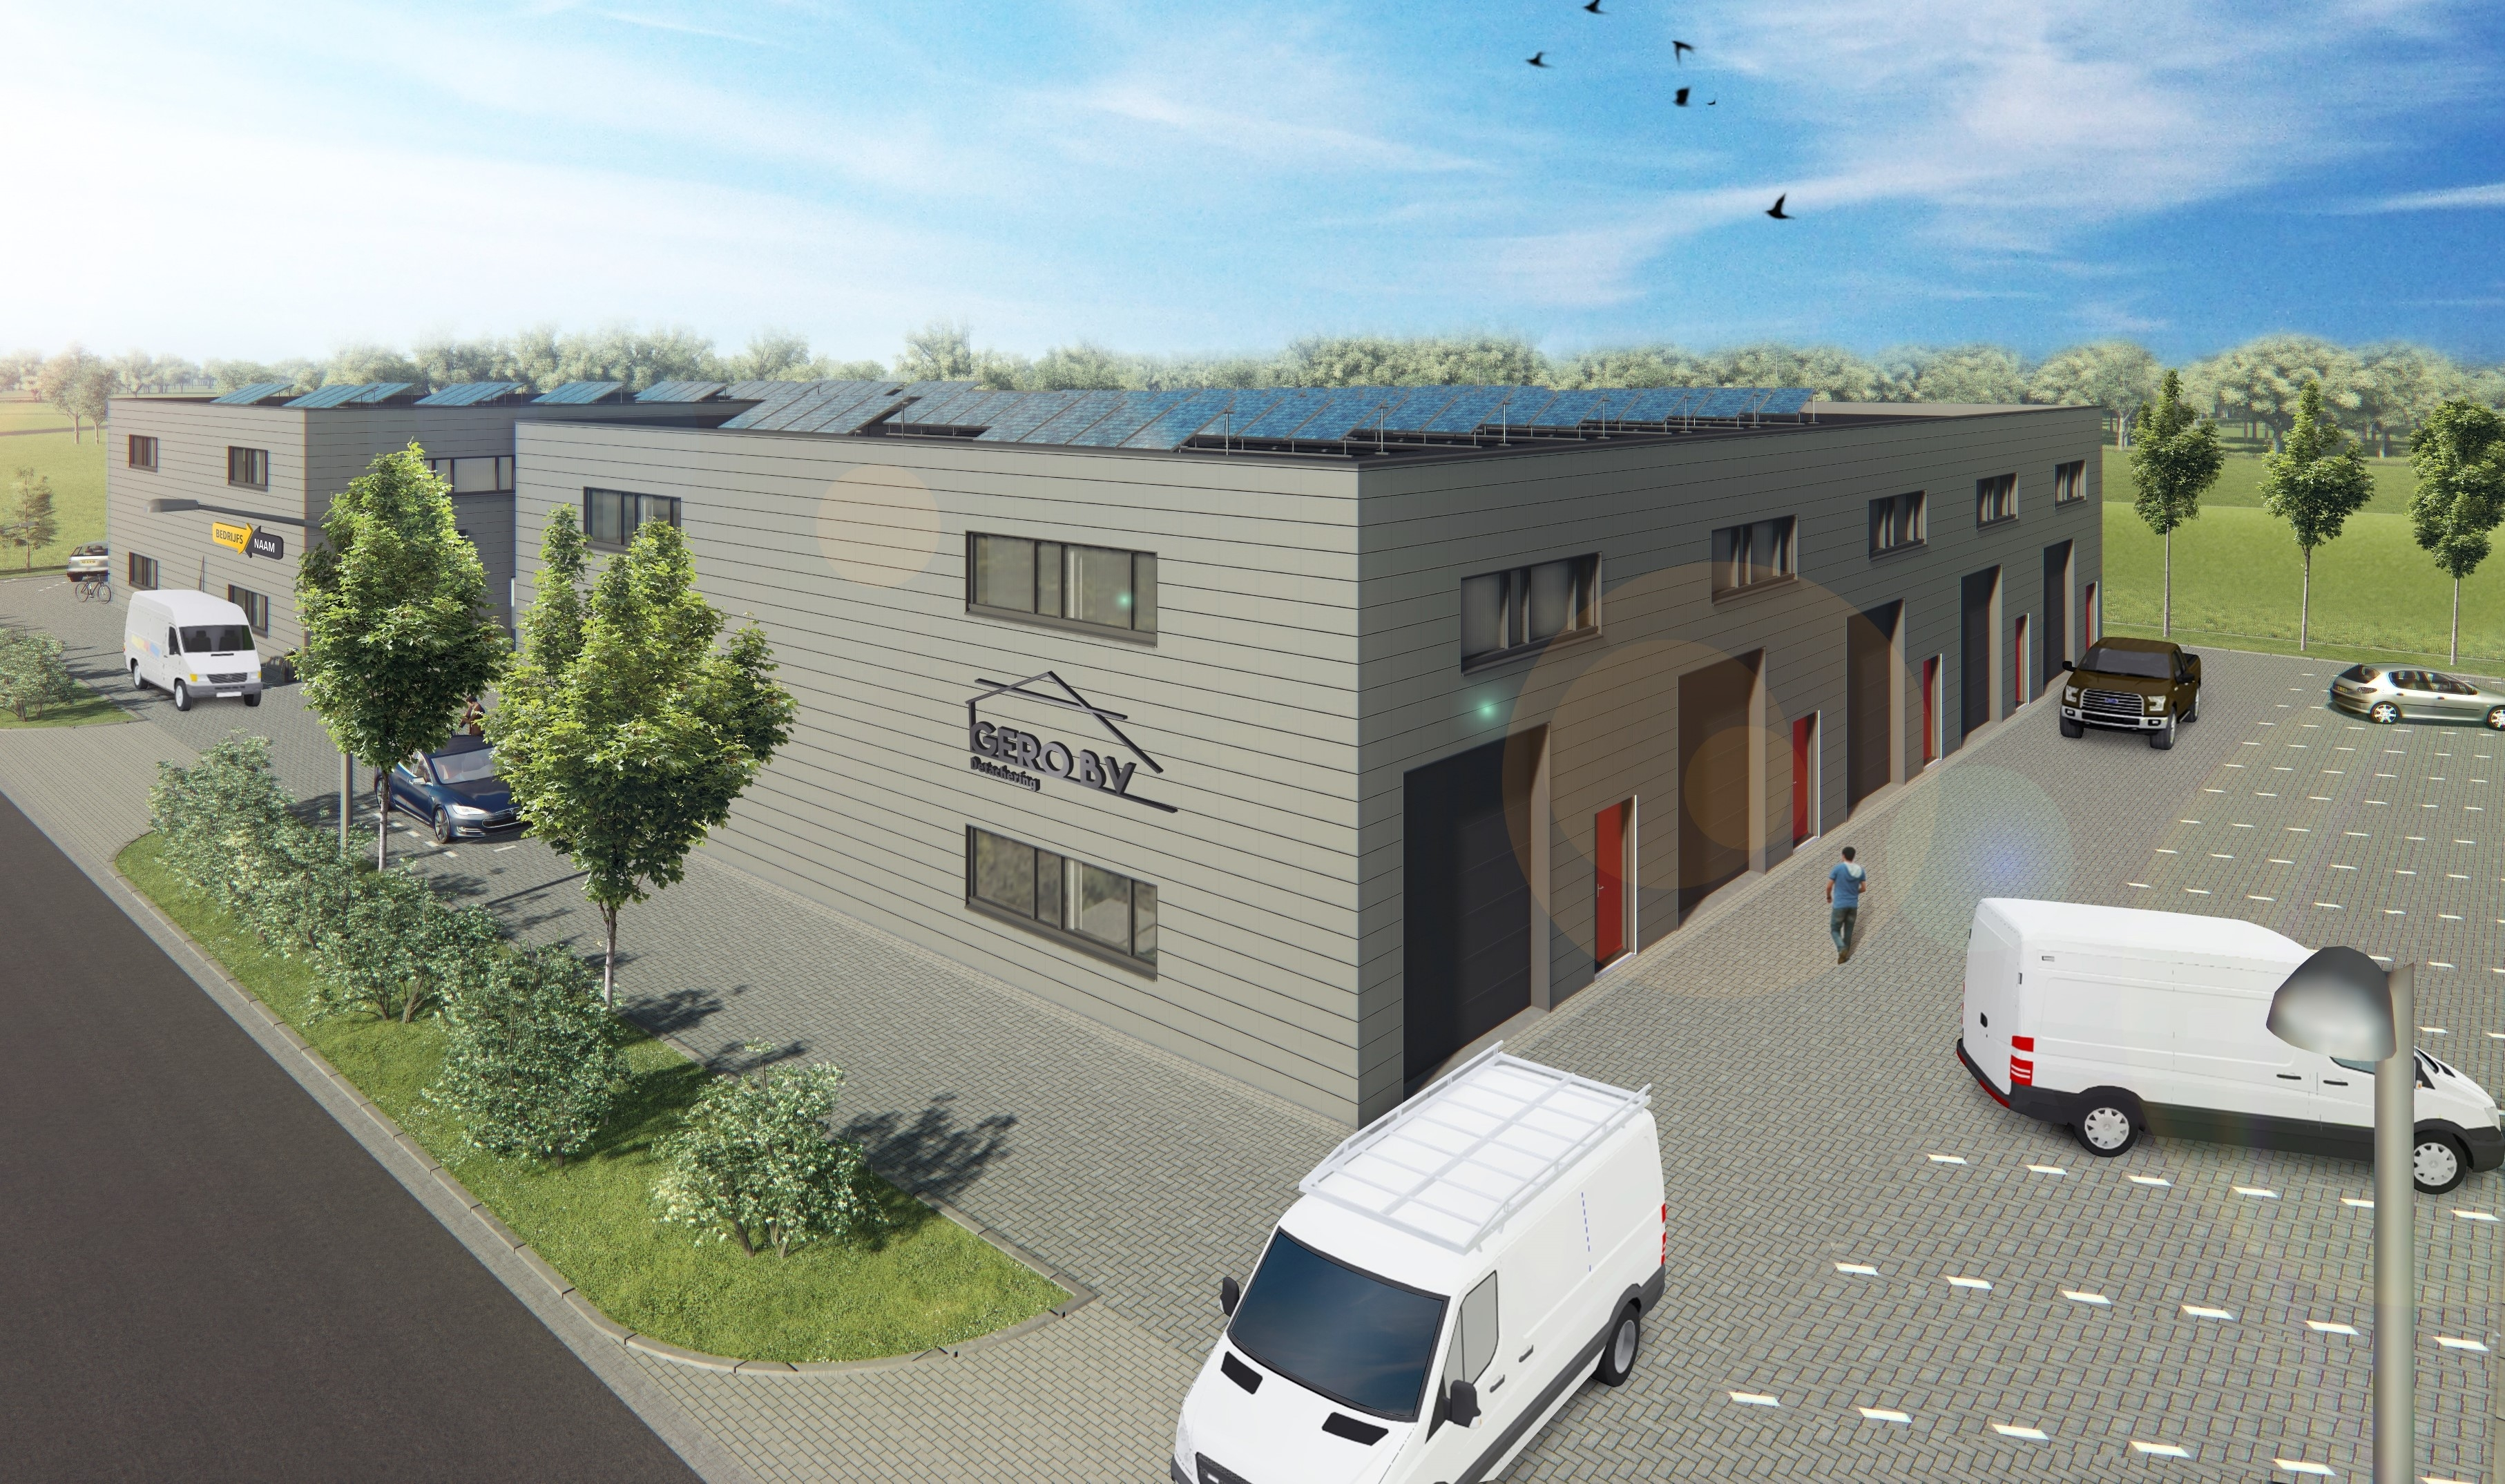 Bedrijfsverzamelgebouwen op A1 Bedrijvenpark Deventer